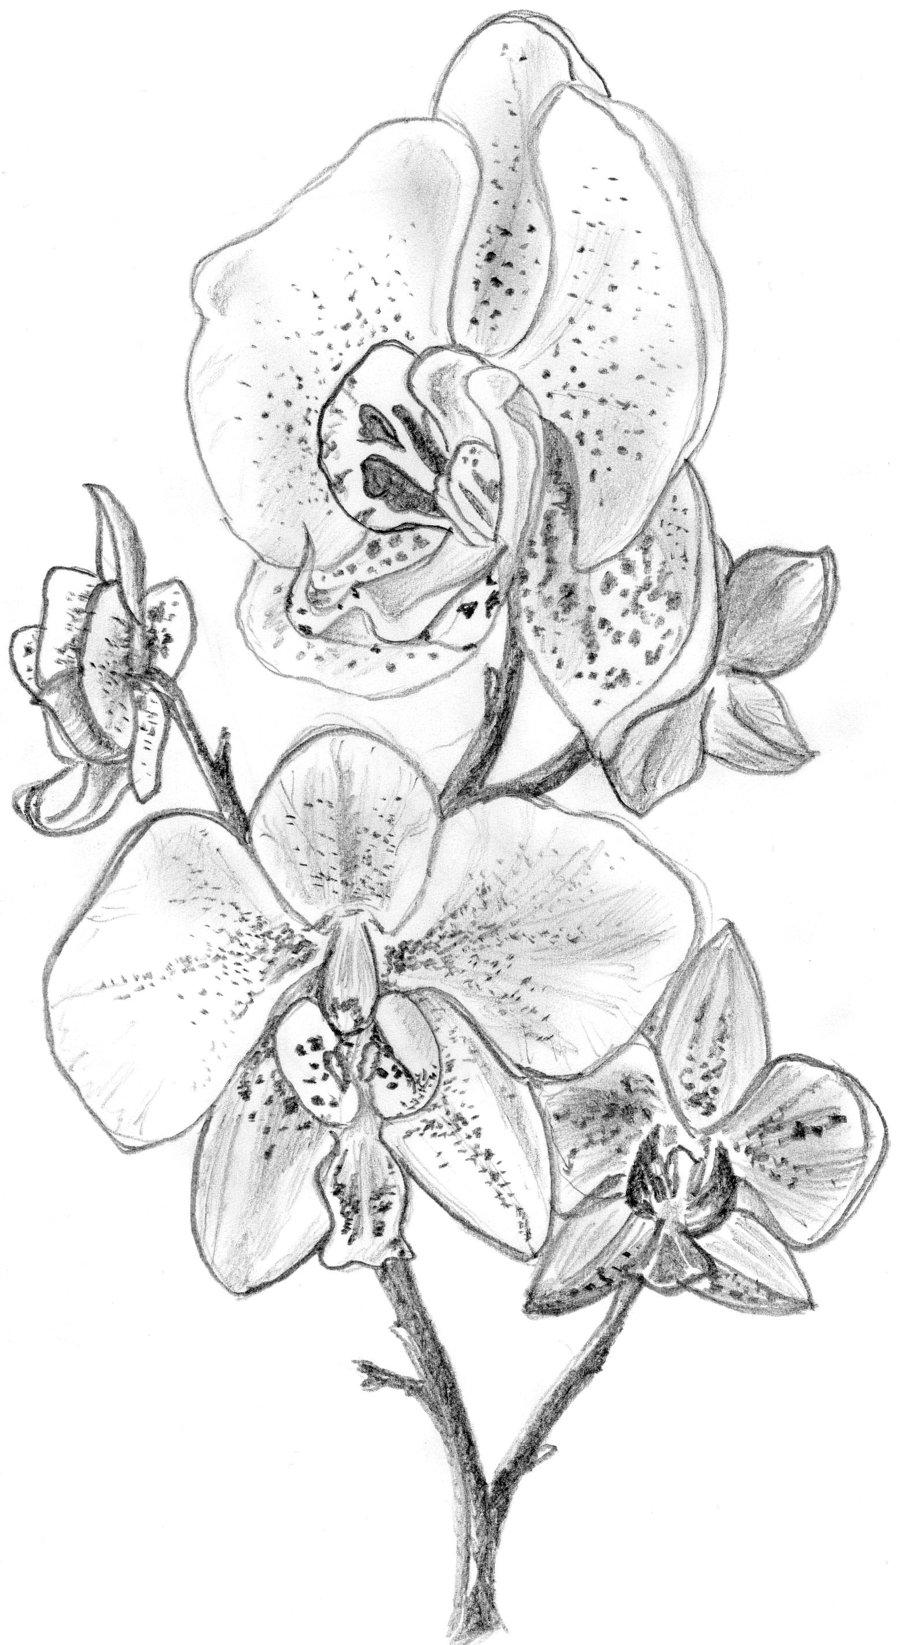 Drawn orchid Tattoo Zeroxy92 Orchid Pinterest